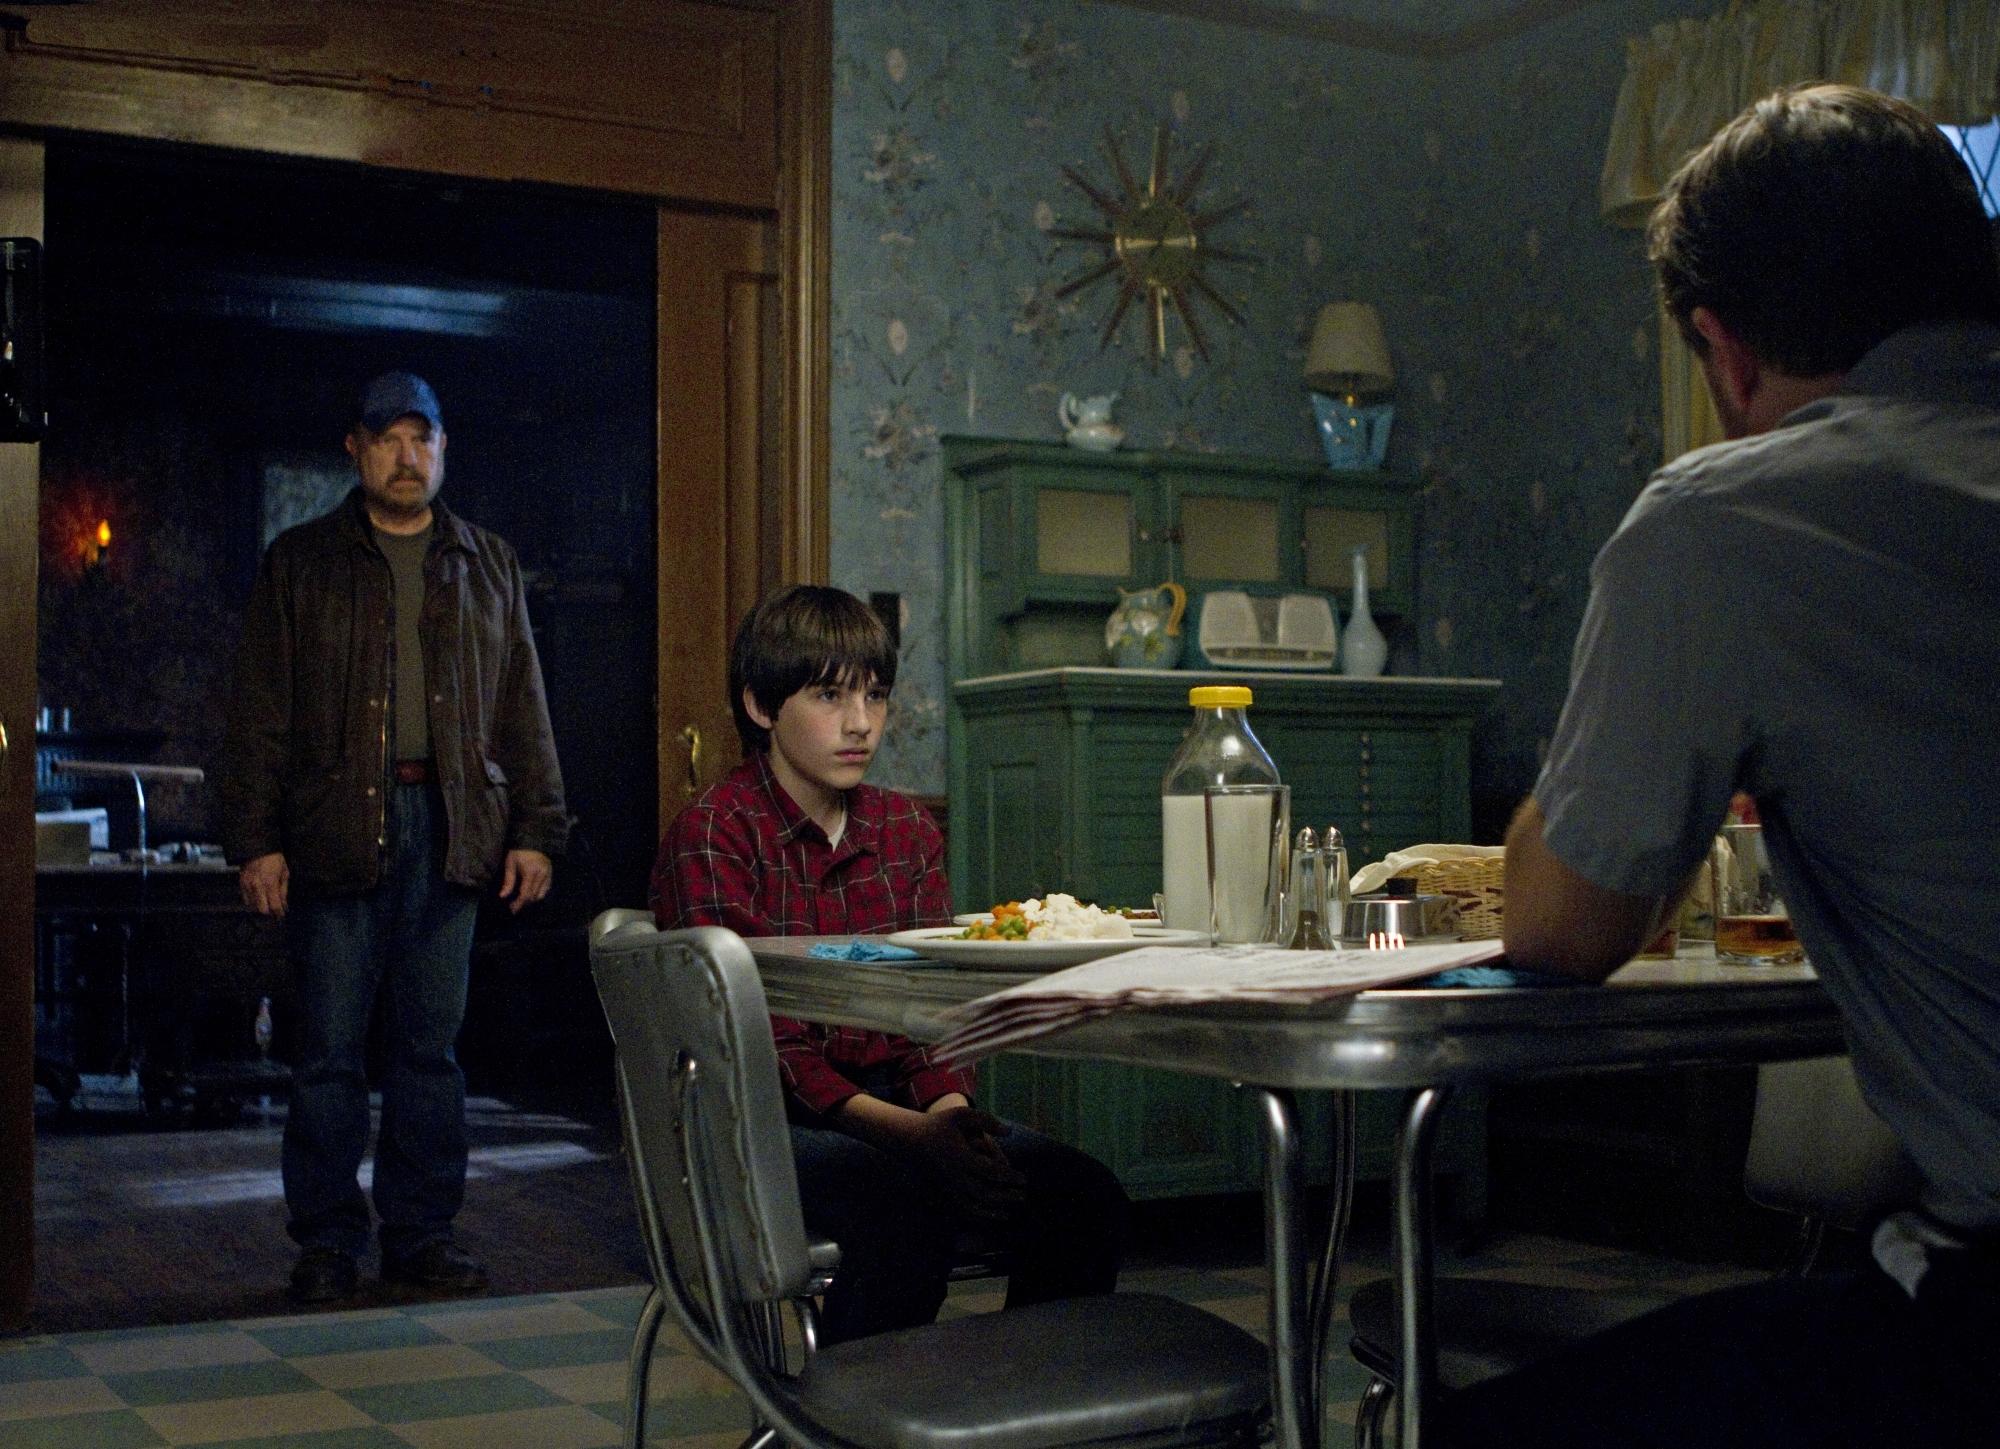 Jim Beaver, Edward Foy, and Collin MacKechnie in Supernatural (2005)